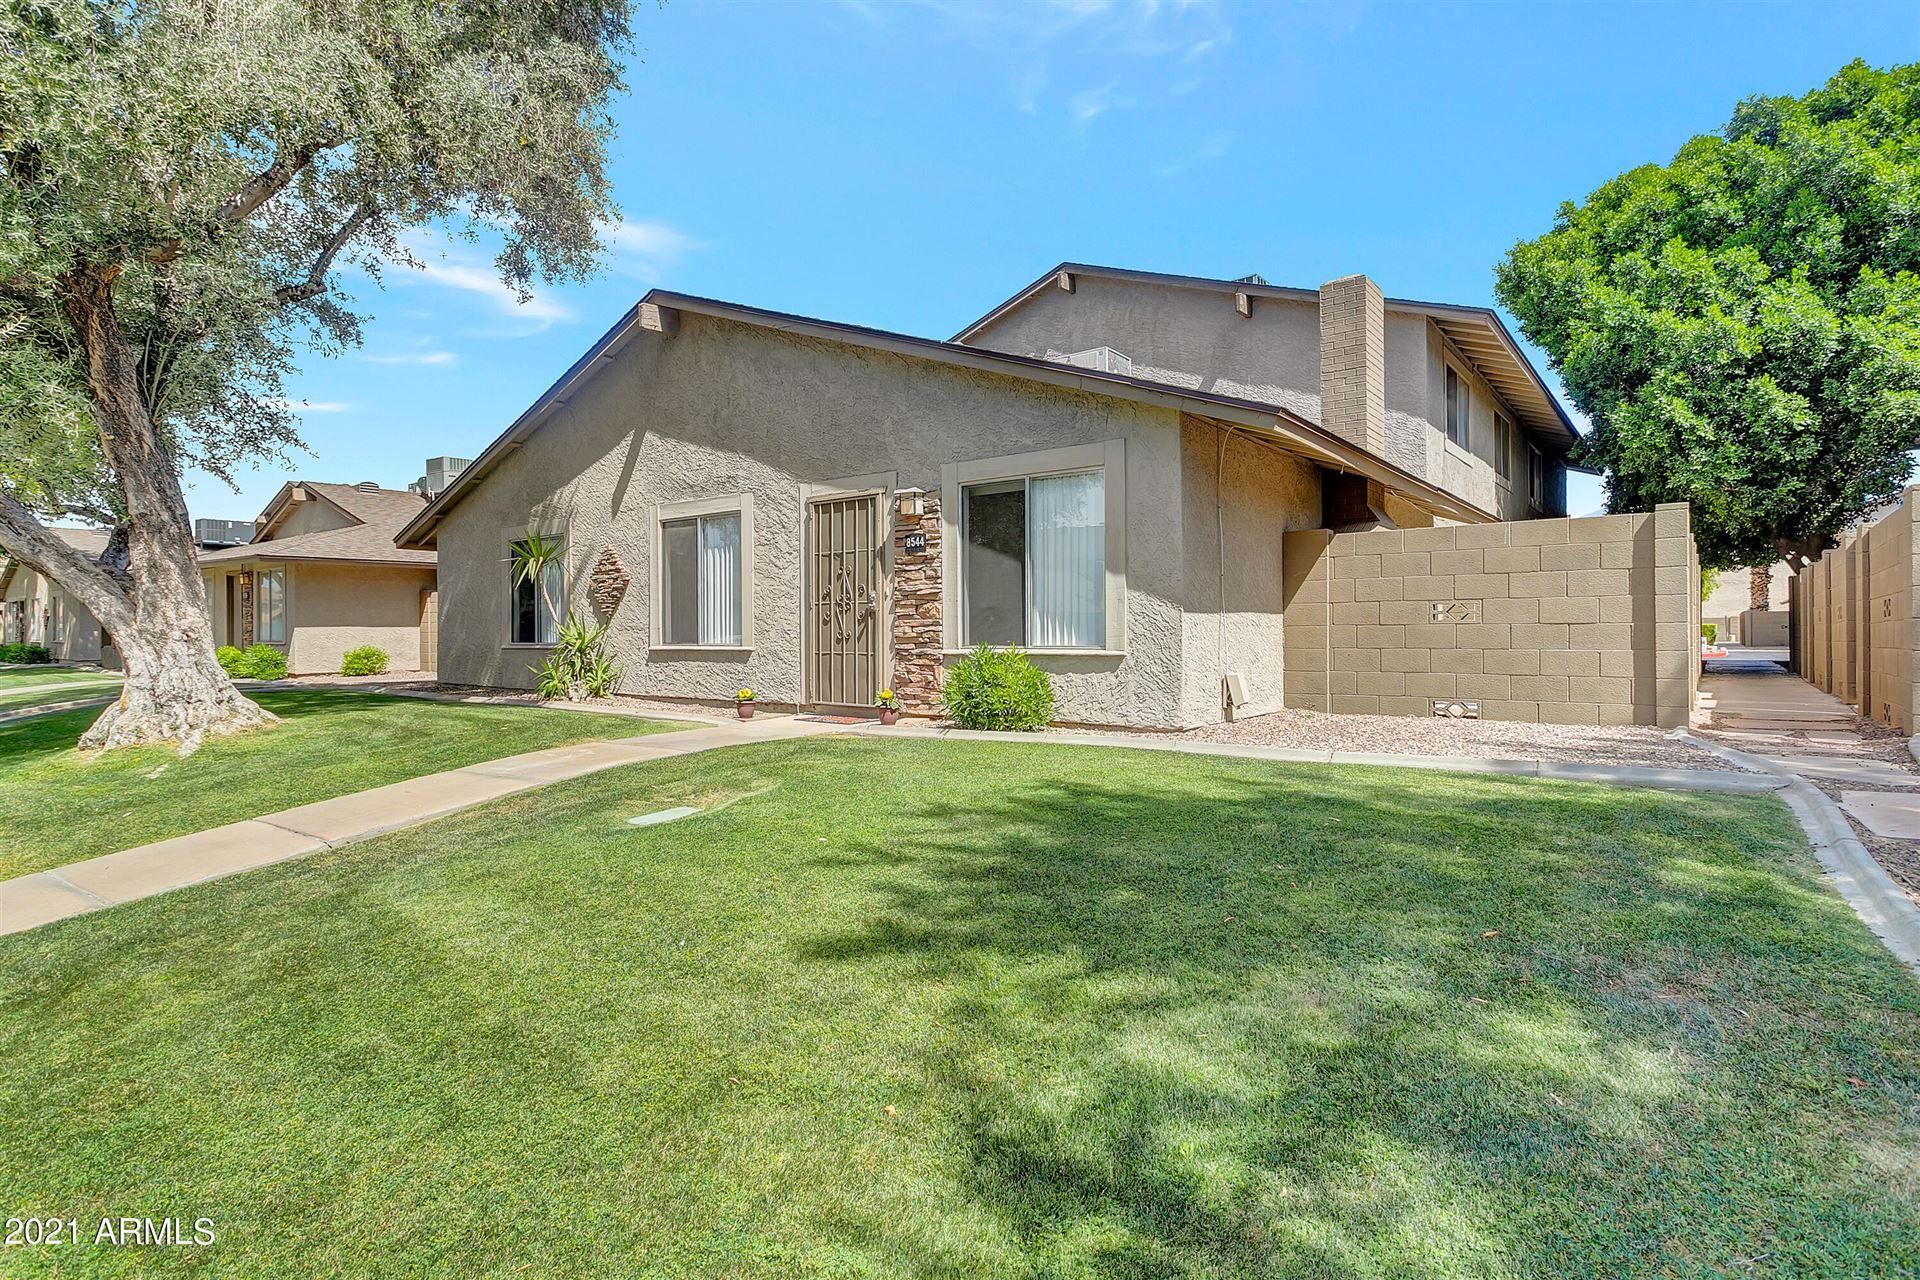 Photo of 8544 E BELLEVIEW Street, Scottsdale, AZ 85257 (MLS # 6232519)